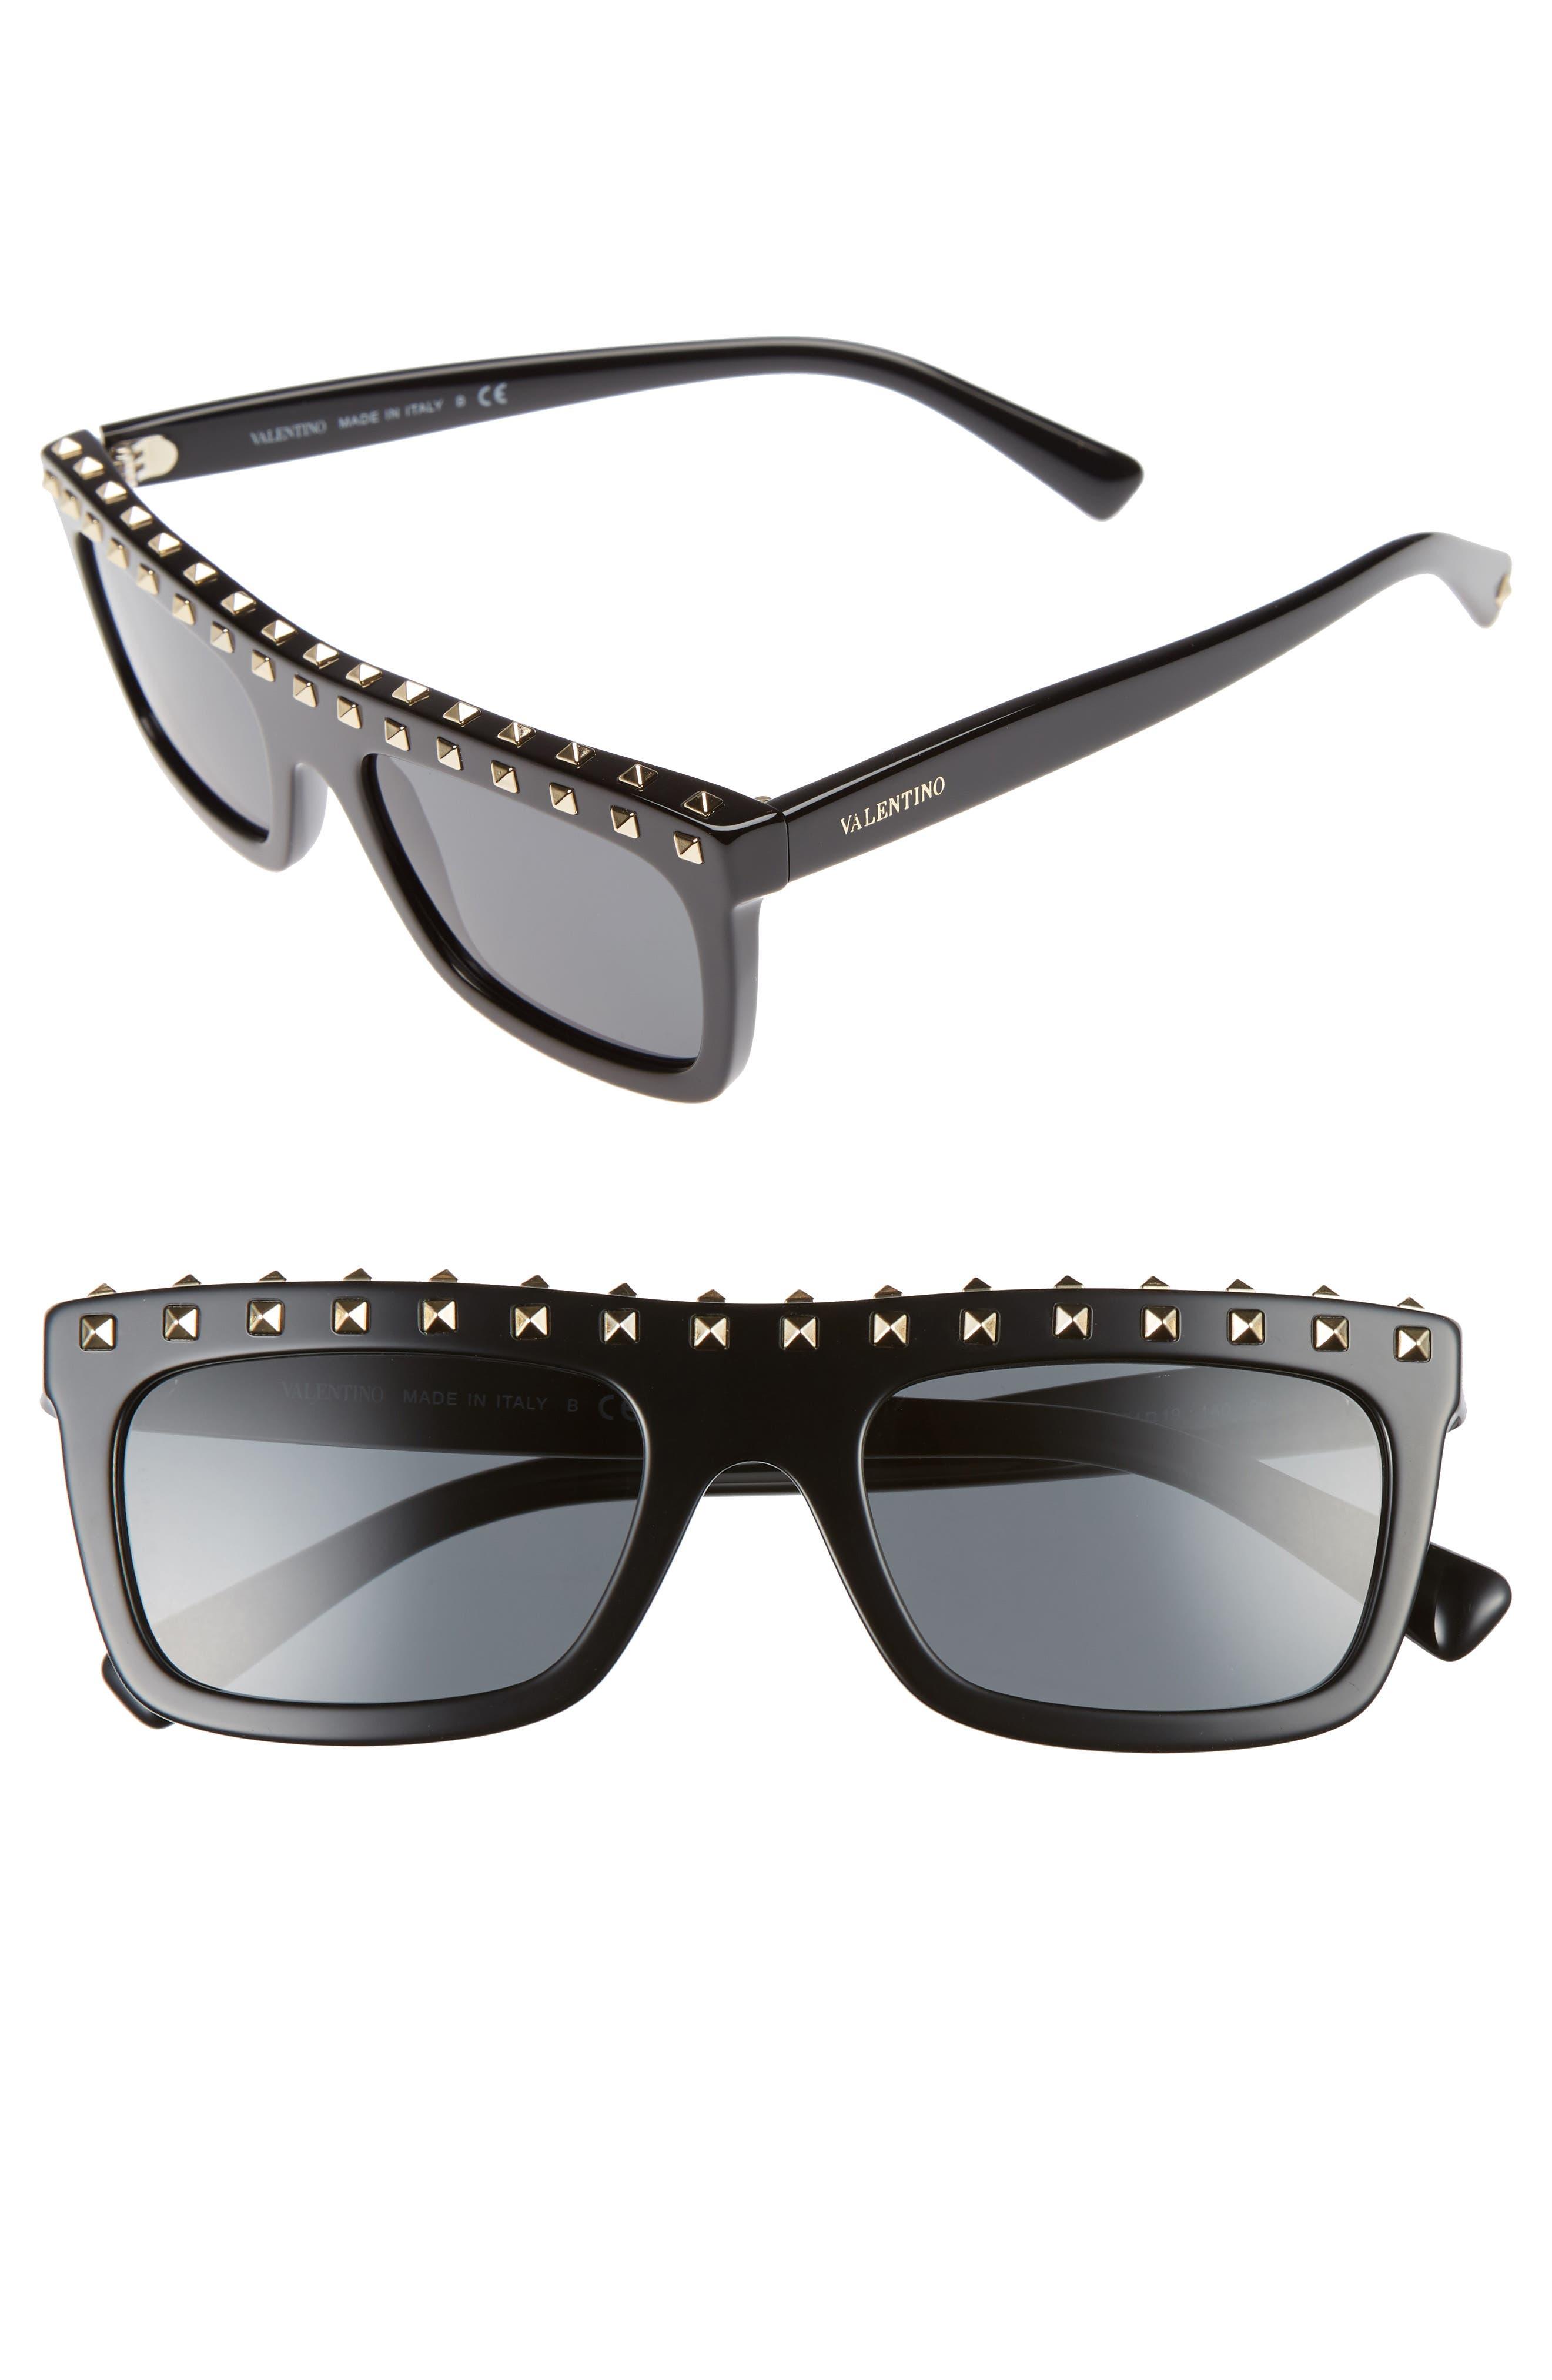 Rockstud 51mm Rectangular Sunglasses,                         Main,                         color, BLACK/ LIGHT GOLD